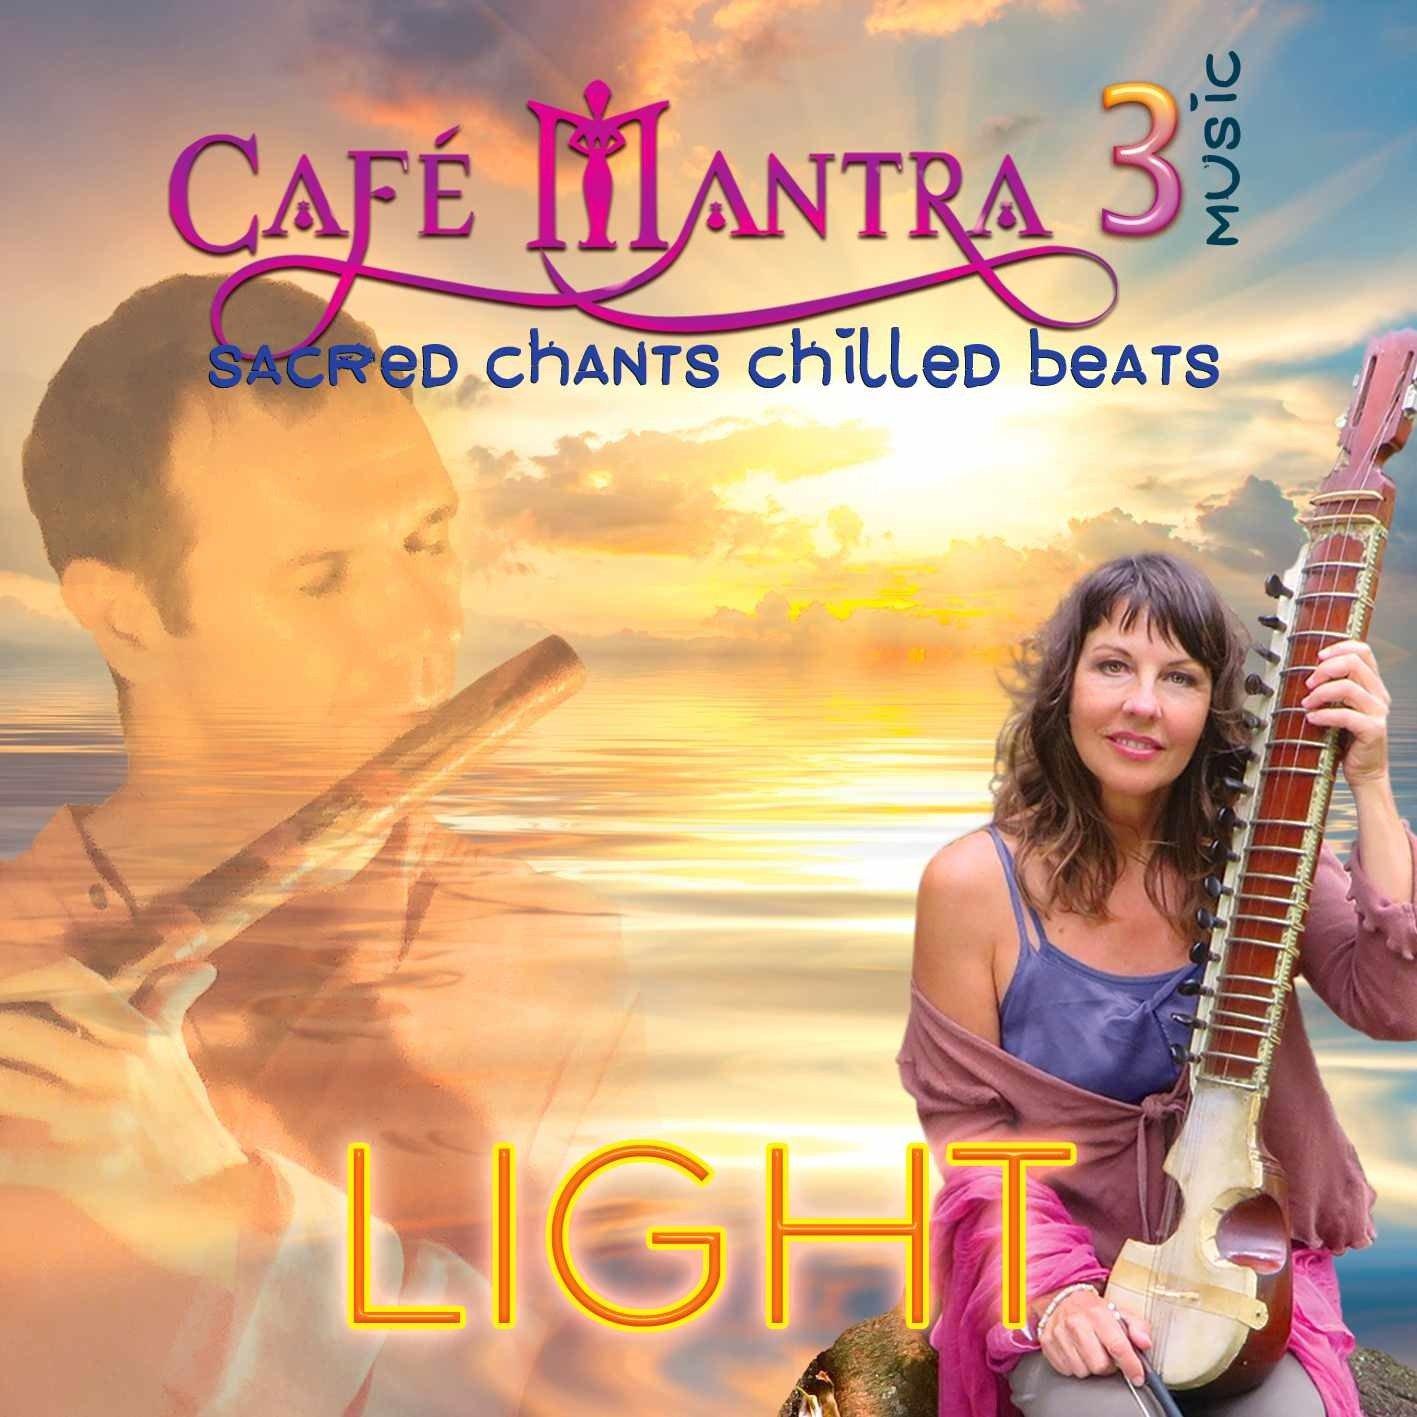 CD Cafe Mantra Music3 LIGHT